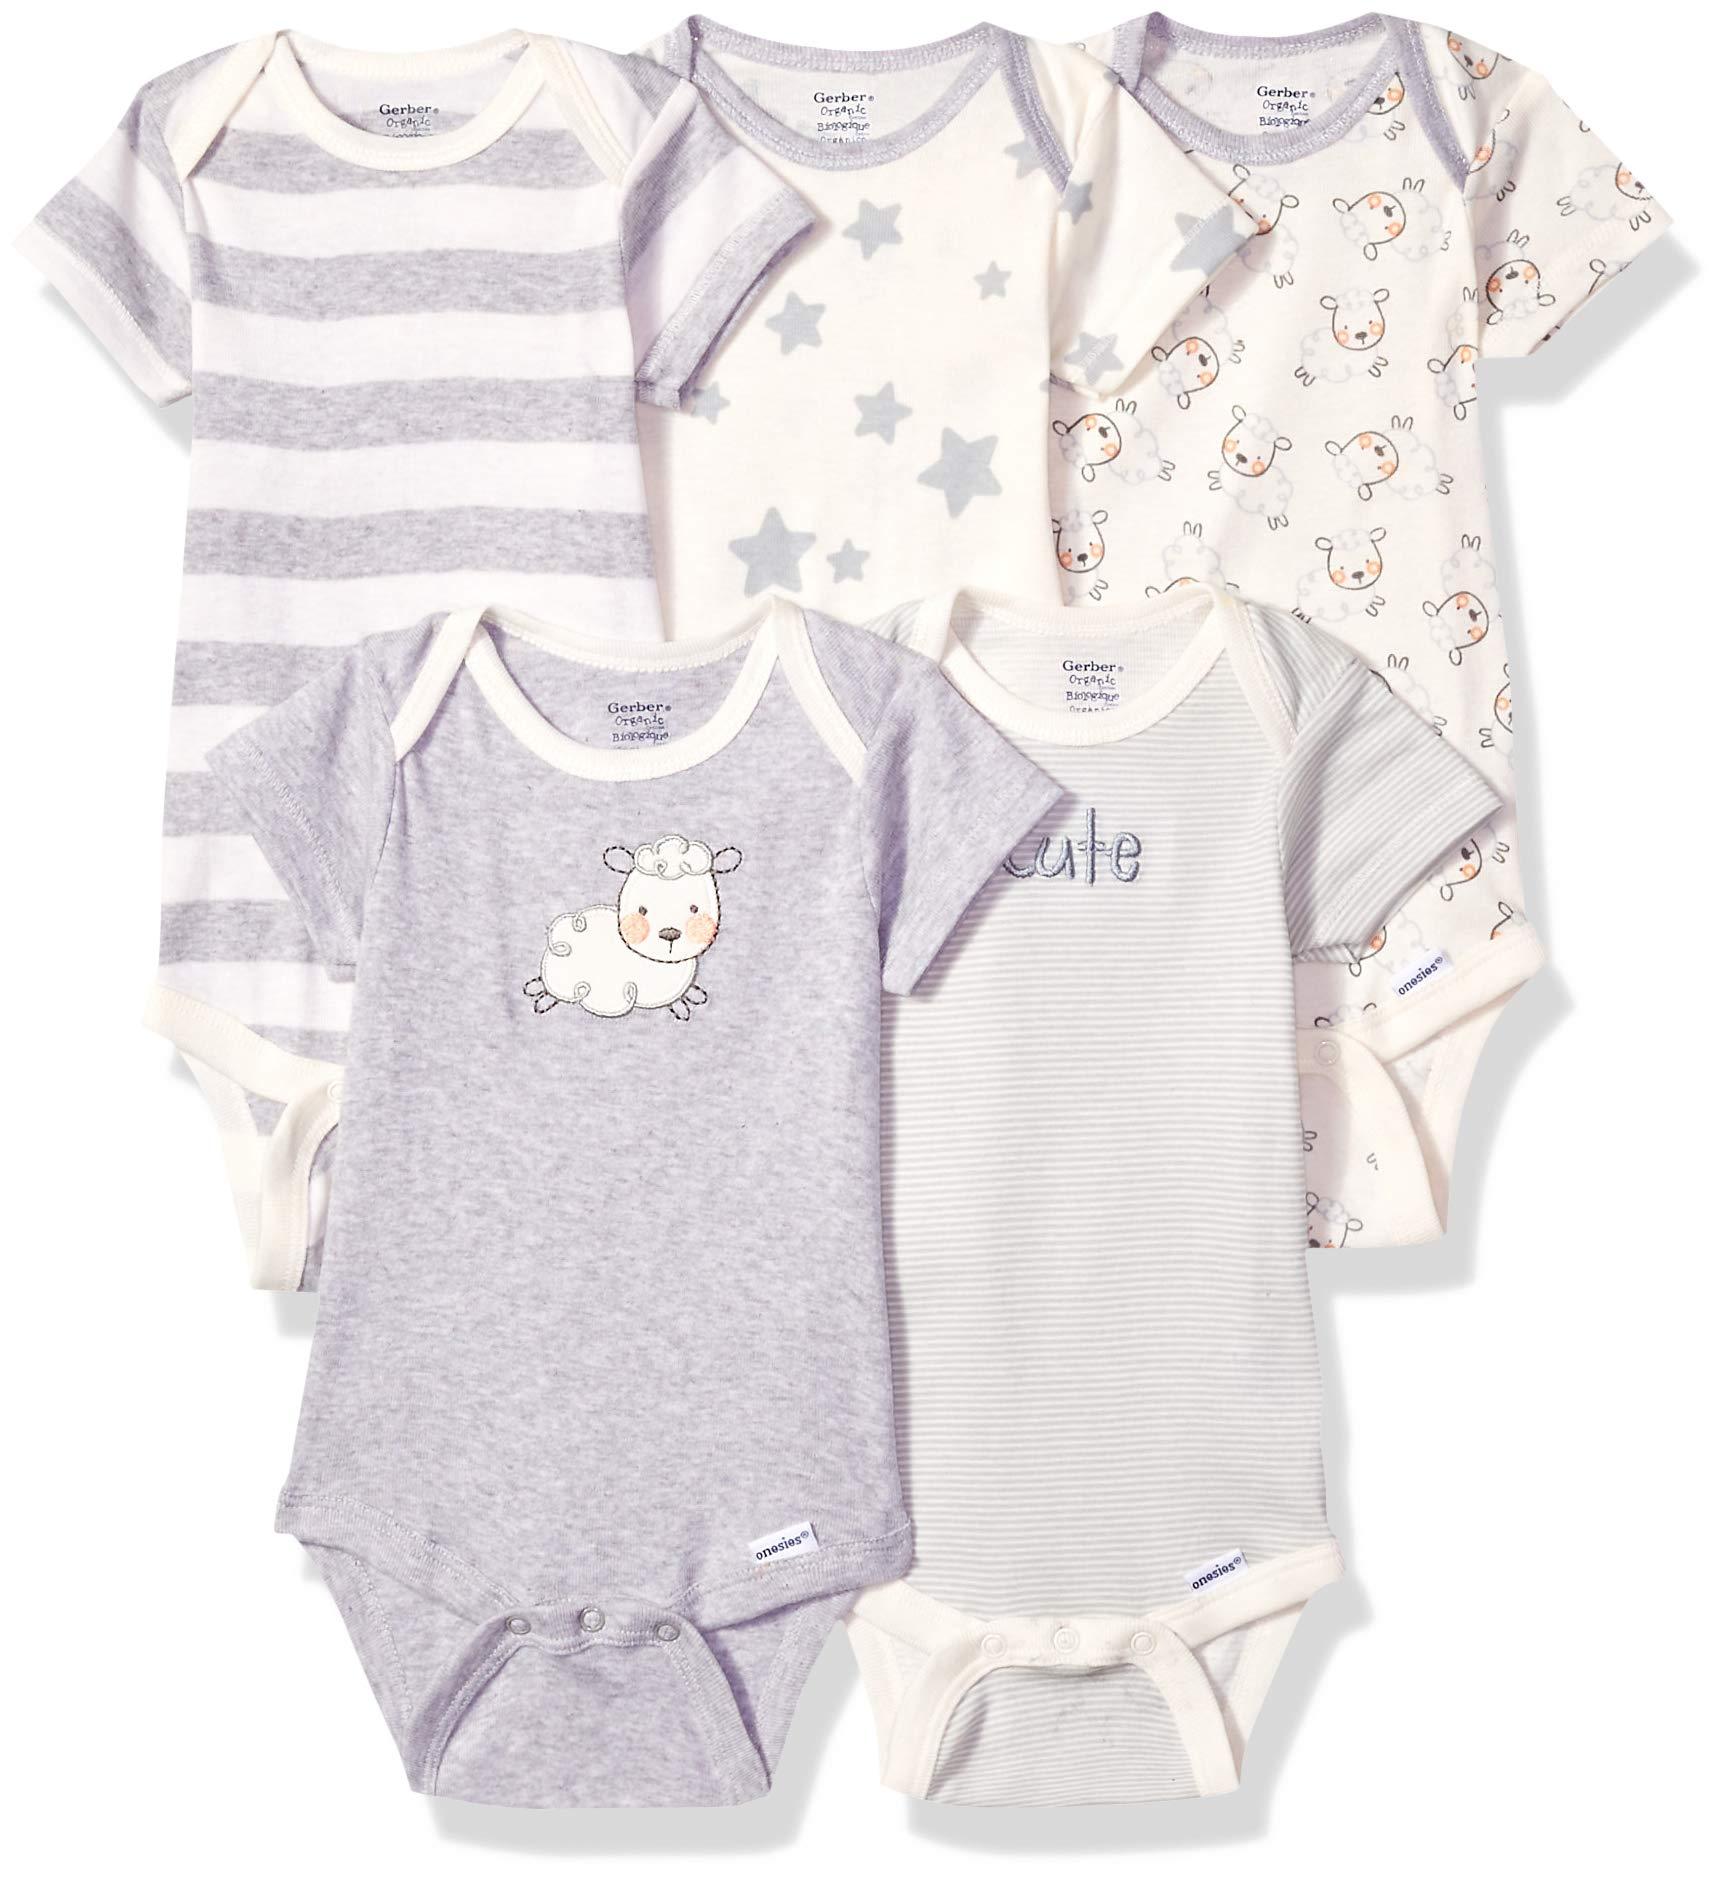 5-pack or 15 Multi Size Organic Short Sleeve Onesies Bodysuits